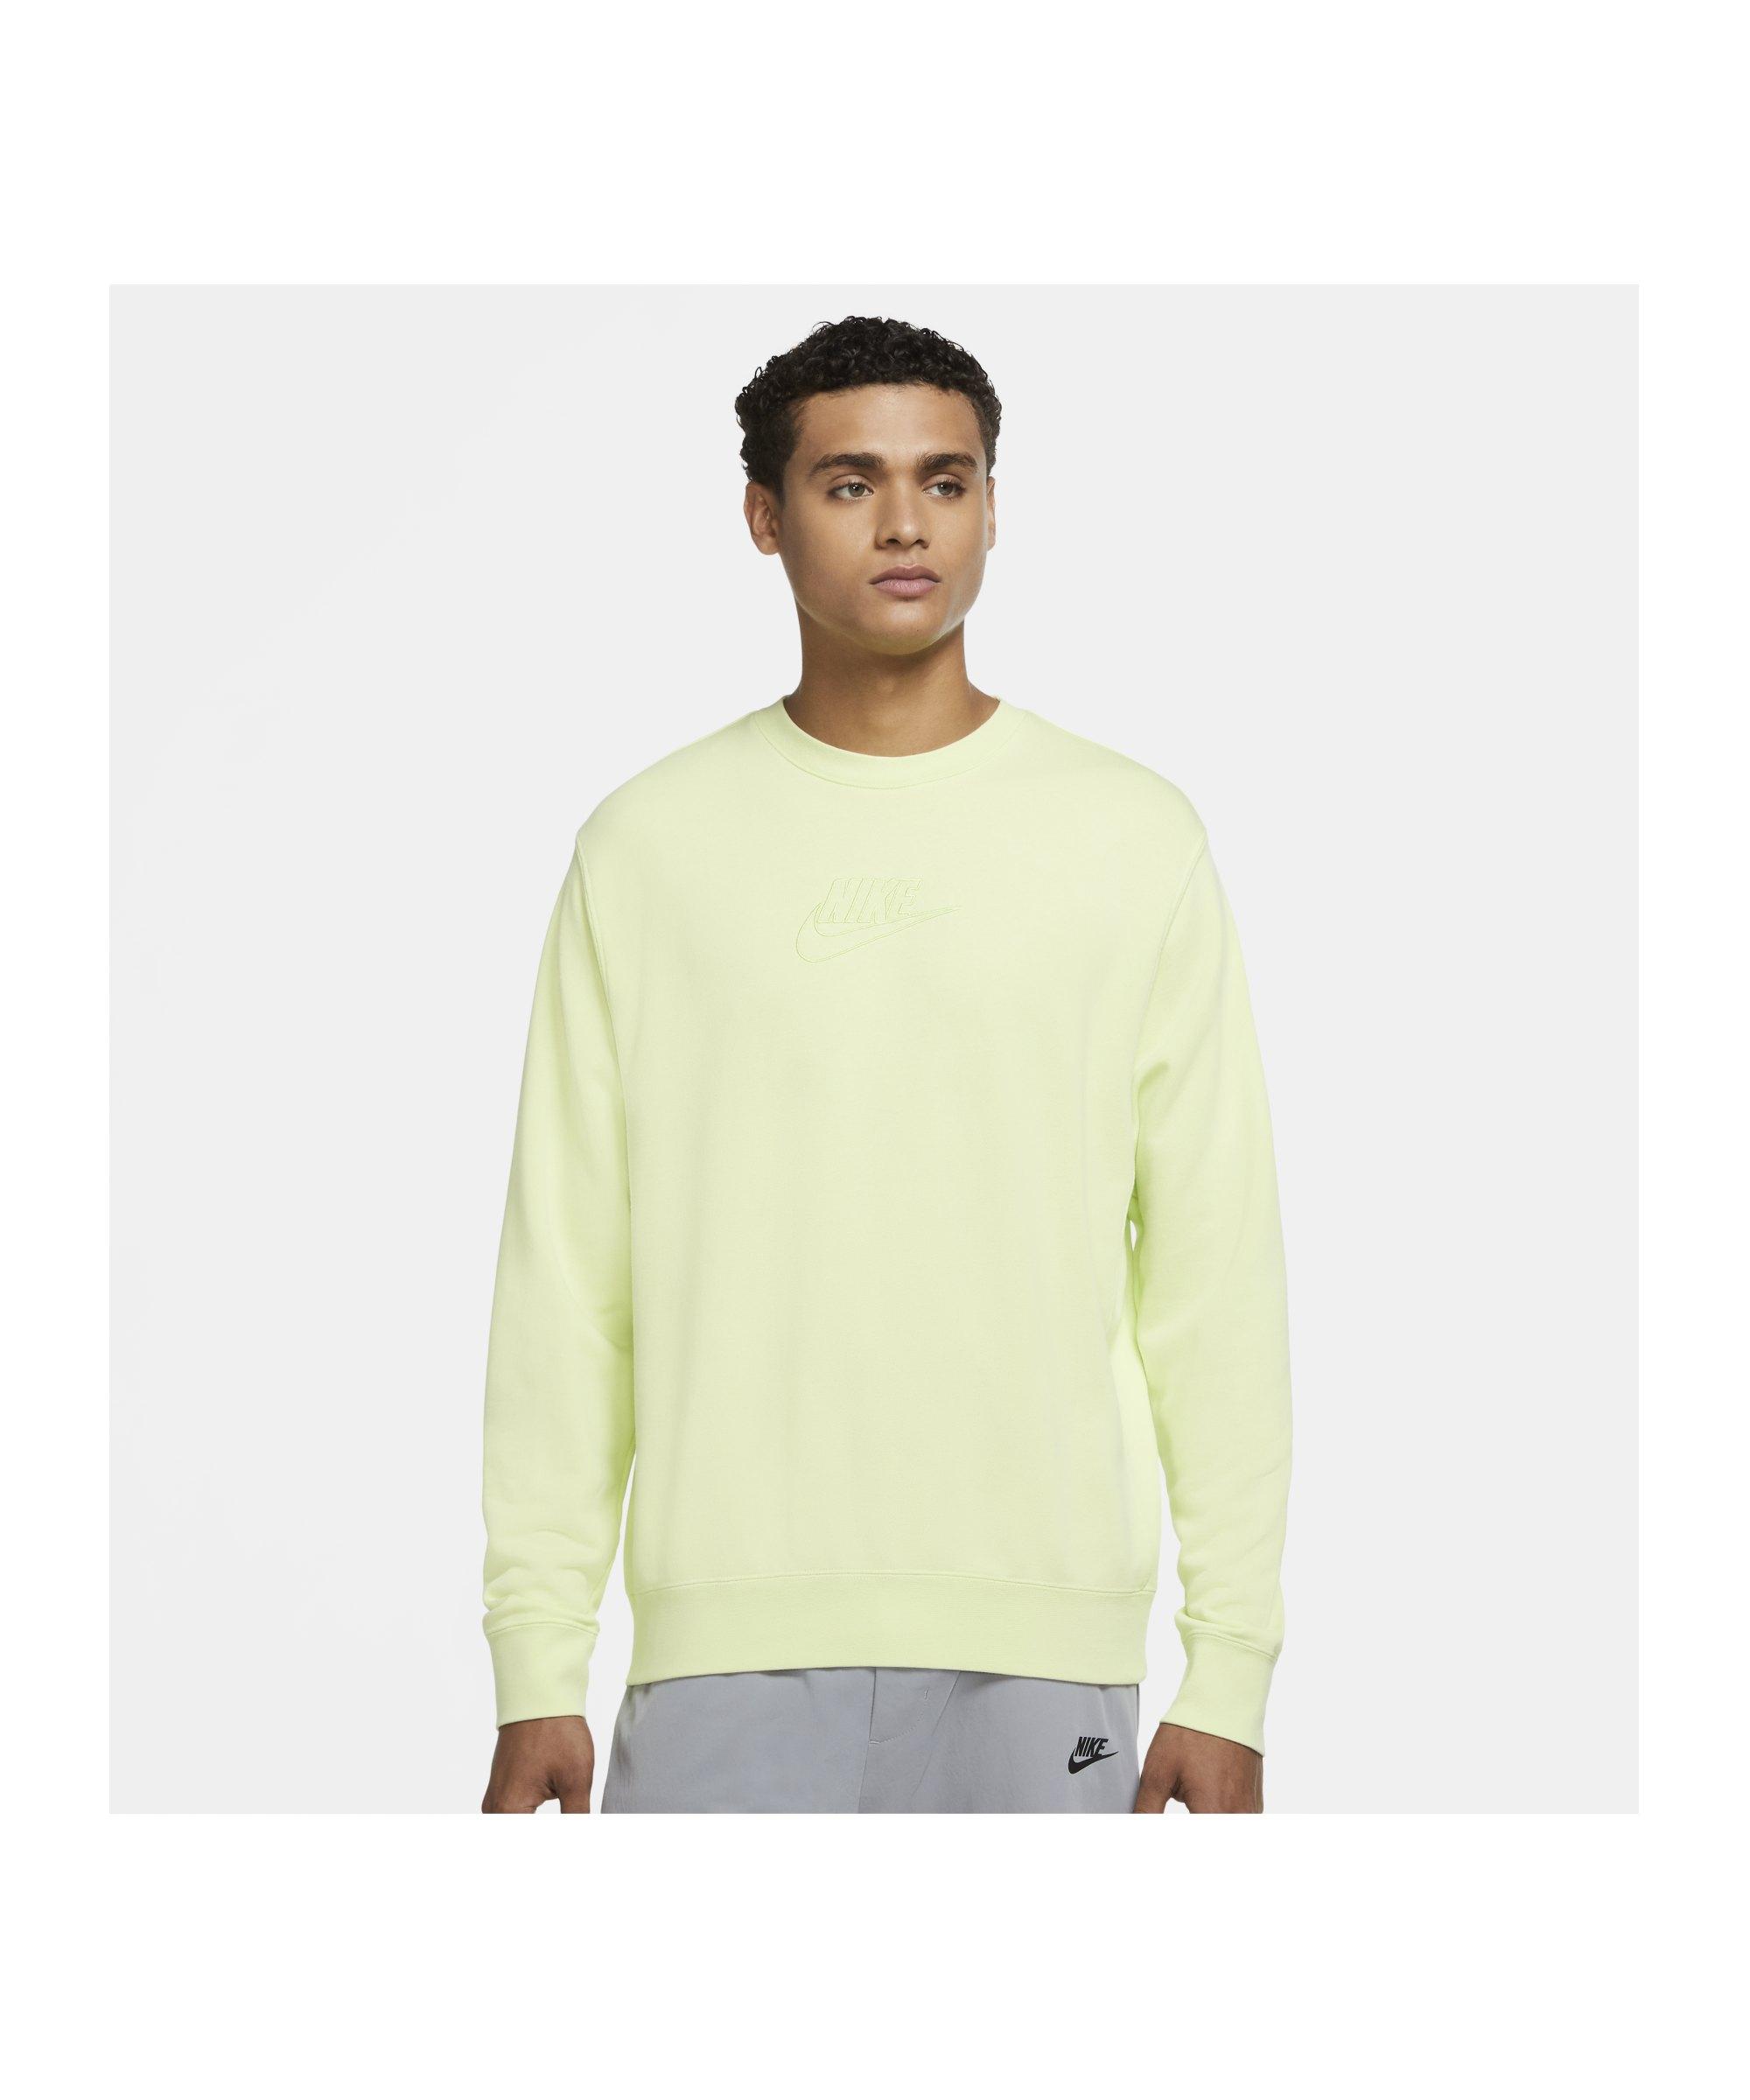 Nike Essentials+ French Terry Crew Sweatshirt F736 - gruen